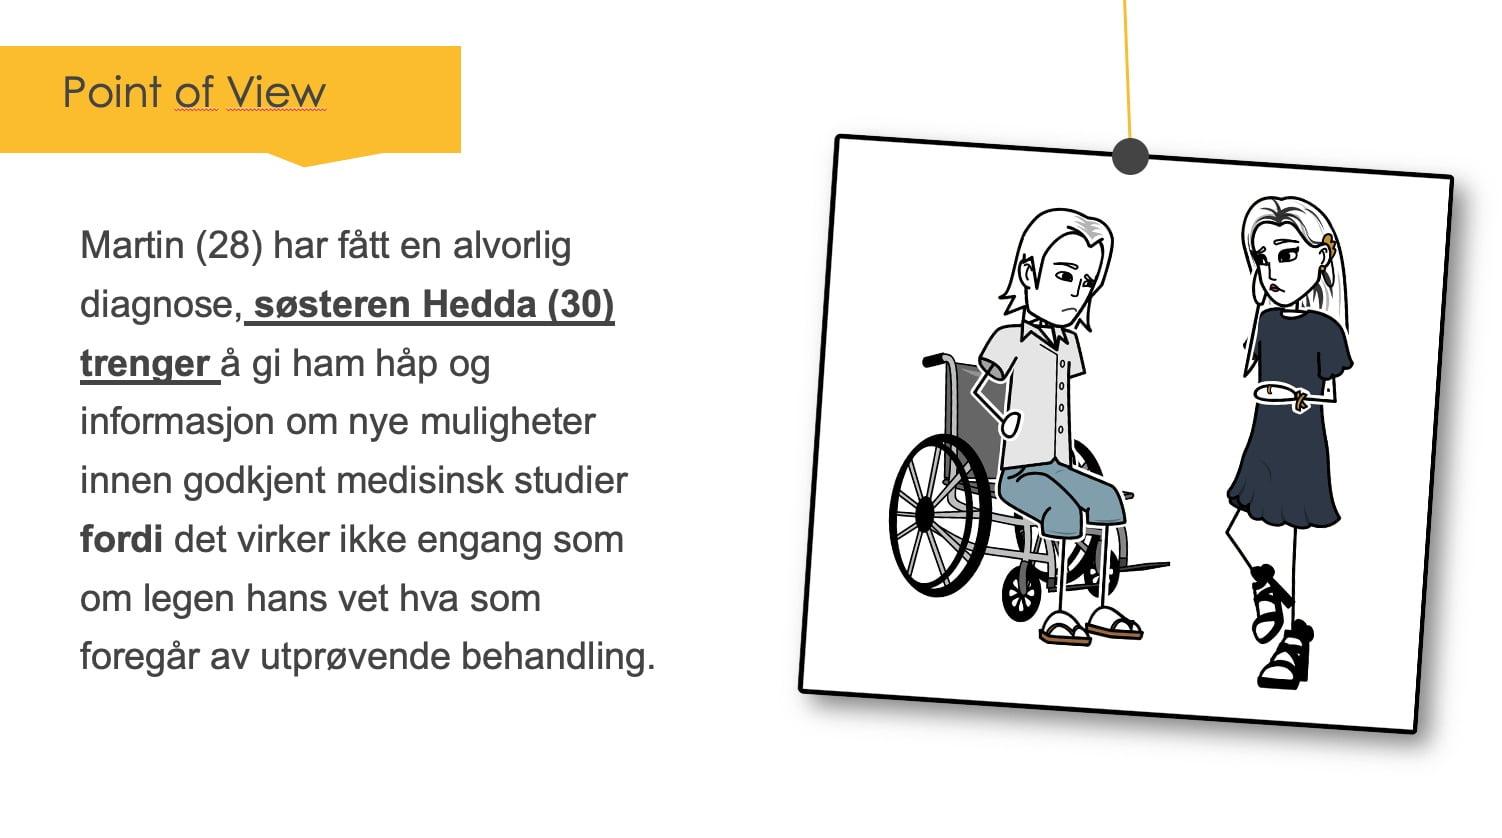 Motor vehicle, Wheel, Tire, Cartoon, Gesture, Font